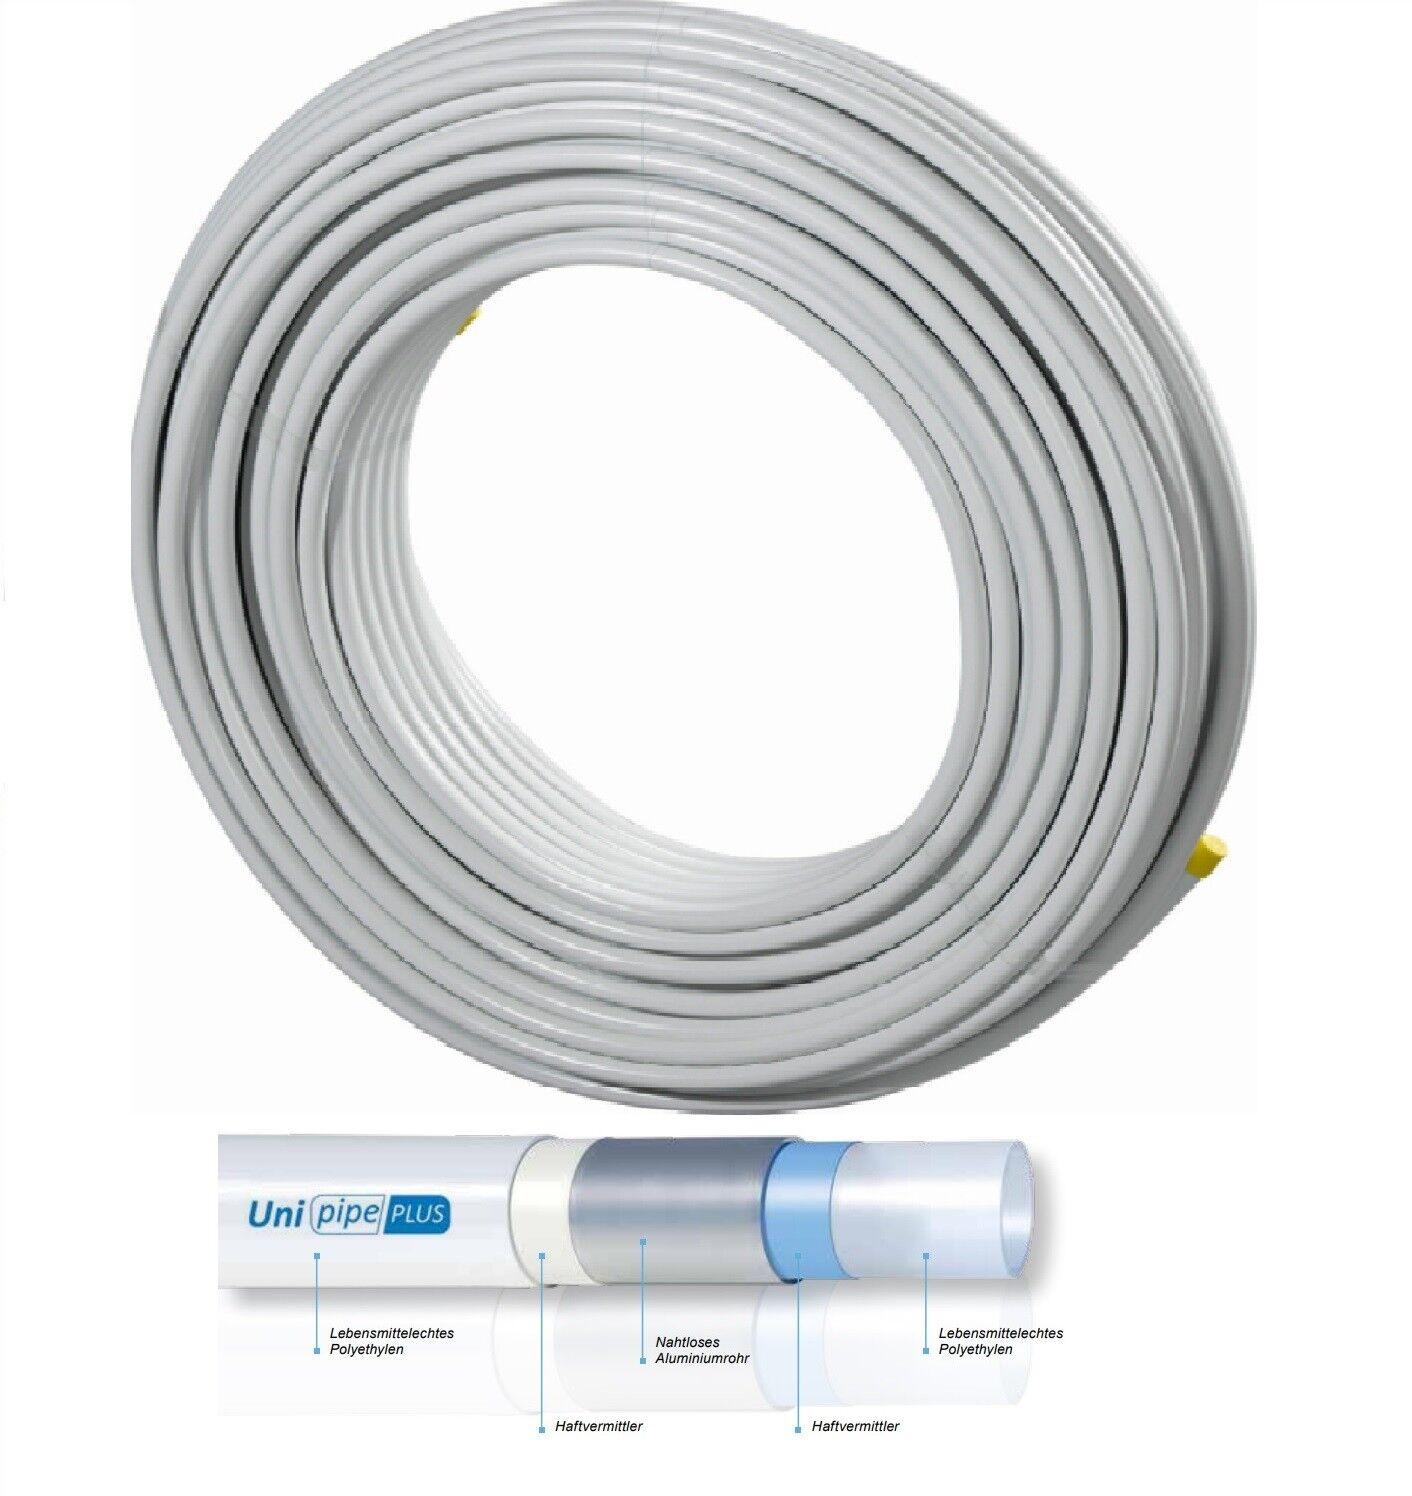 Meterpreis  Verbundrohr Uponor Unipipe Plus 16x2 mm in Ringen a 200 Meter